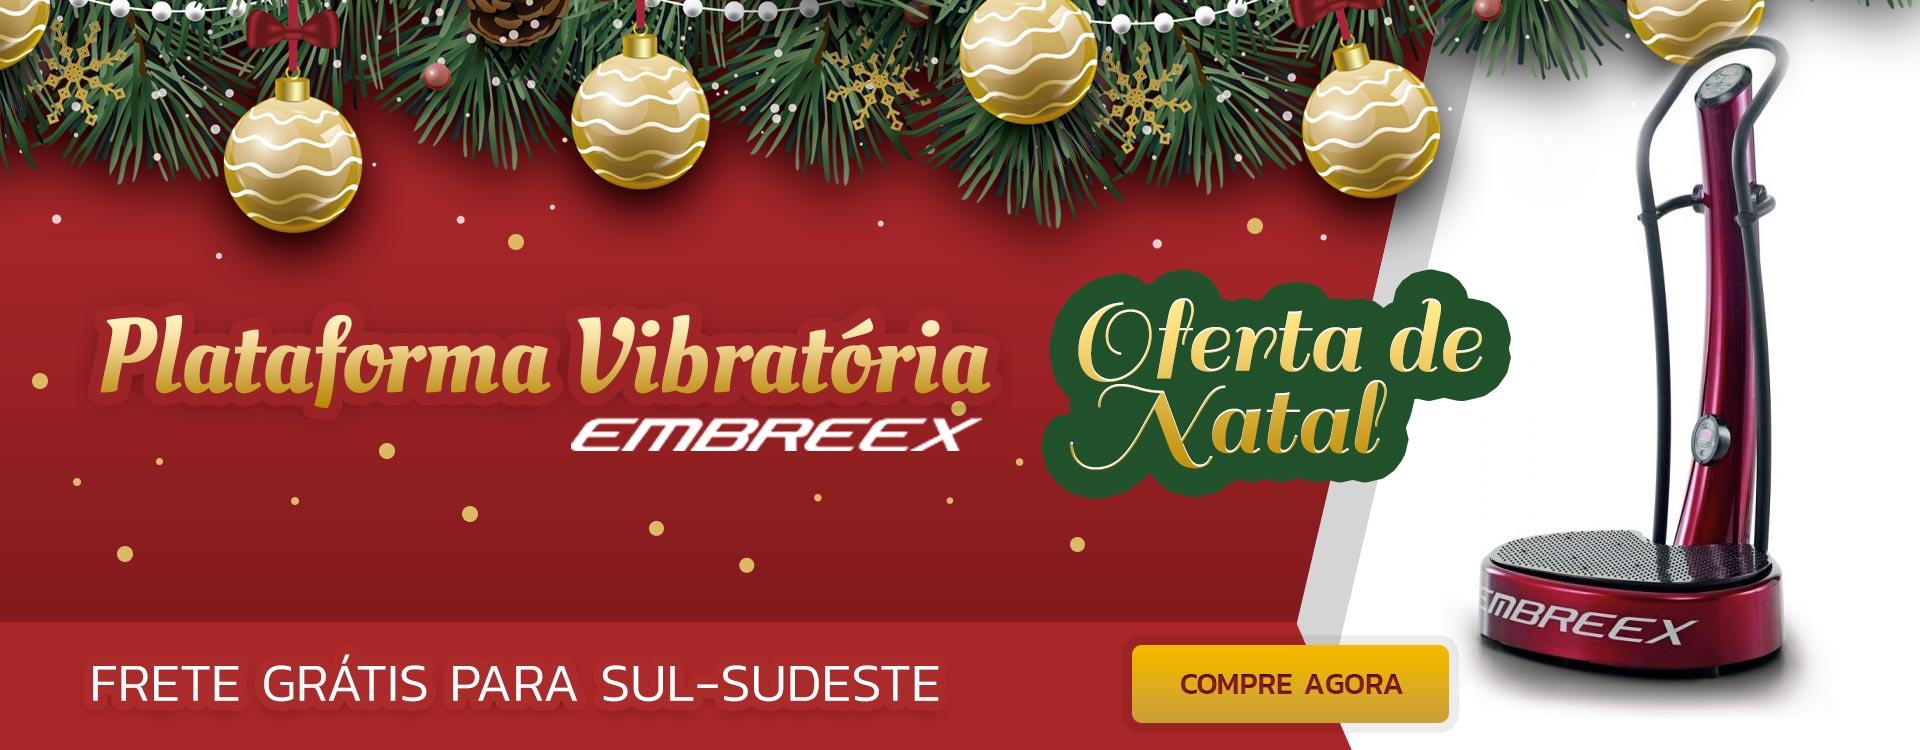 Plataforma Embreex